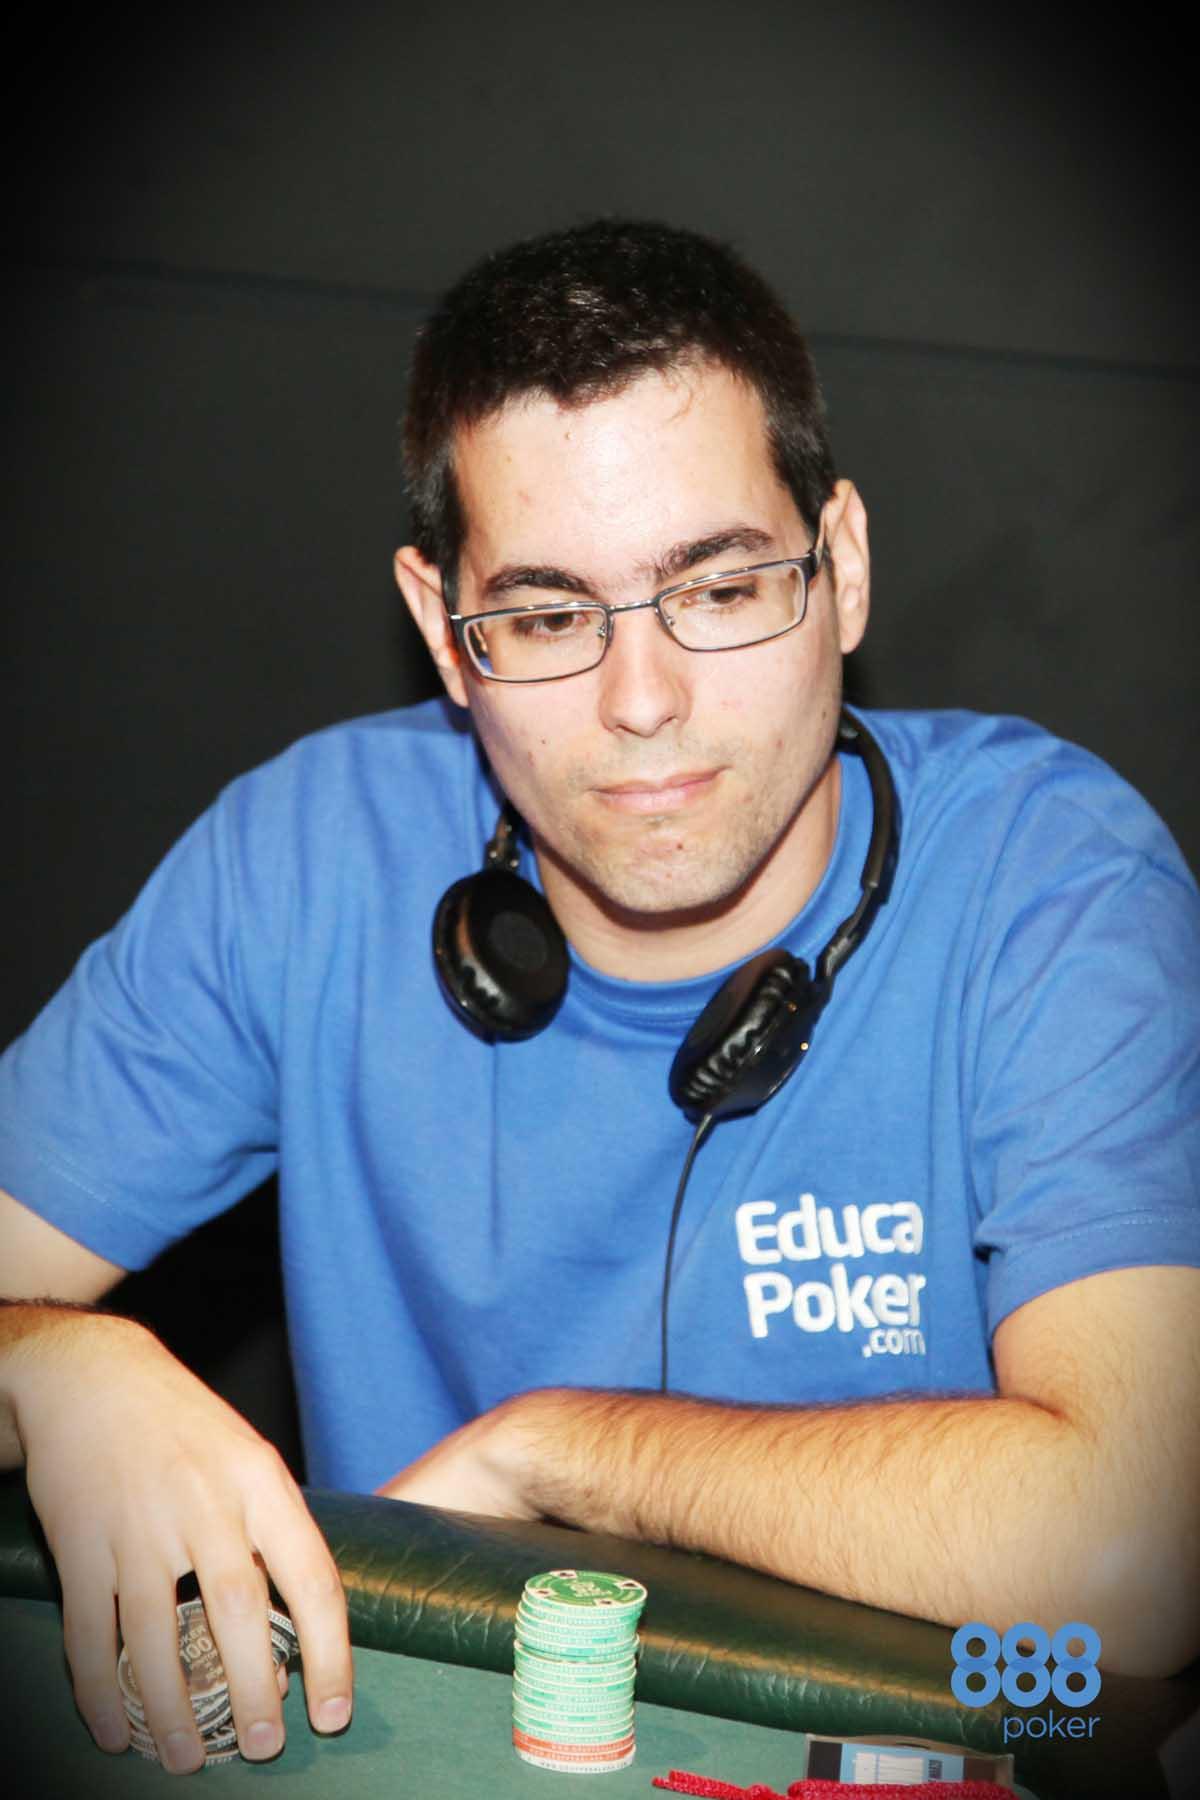 Profile picture for user paris4415